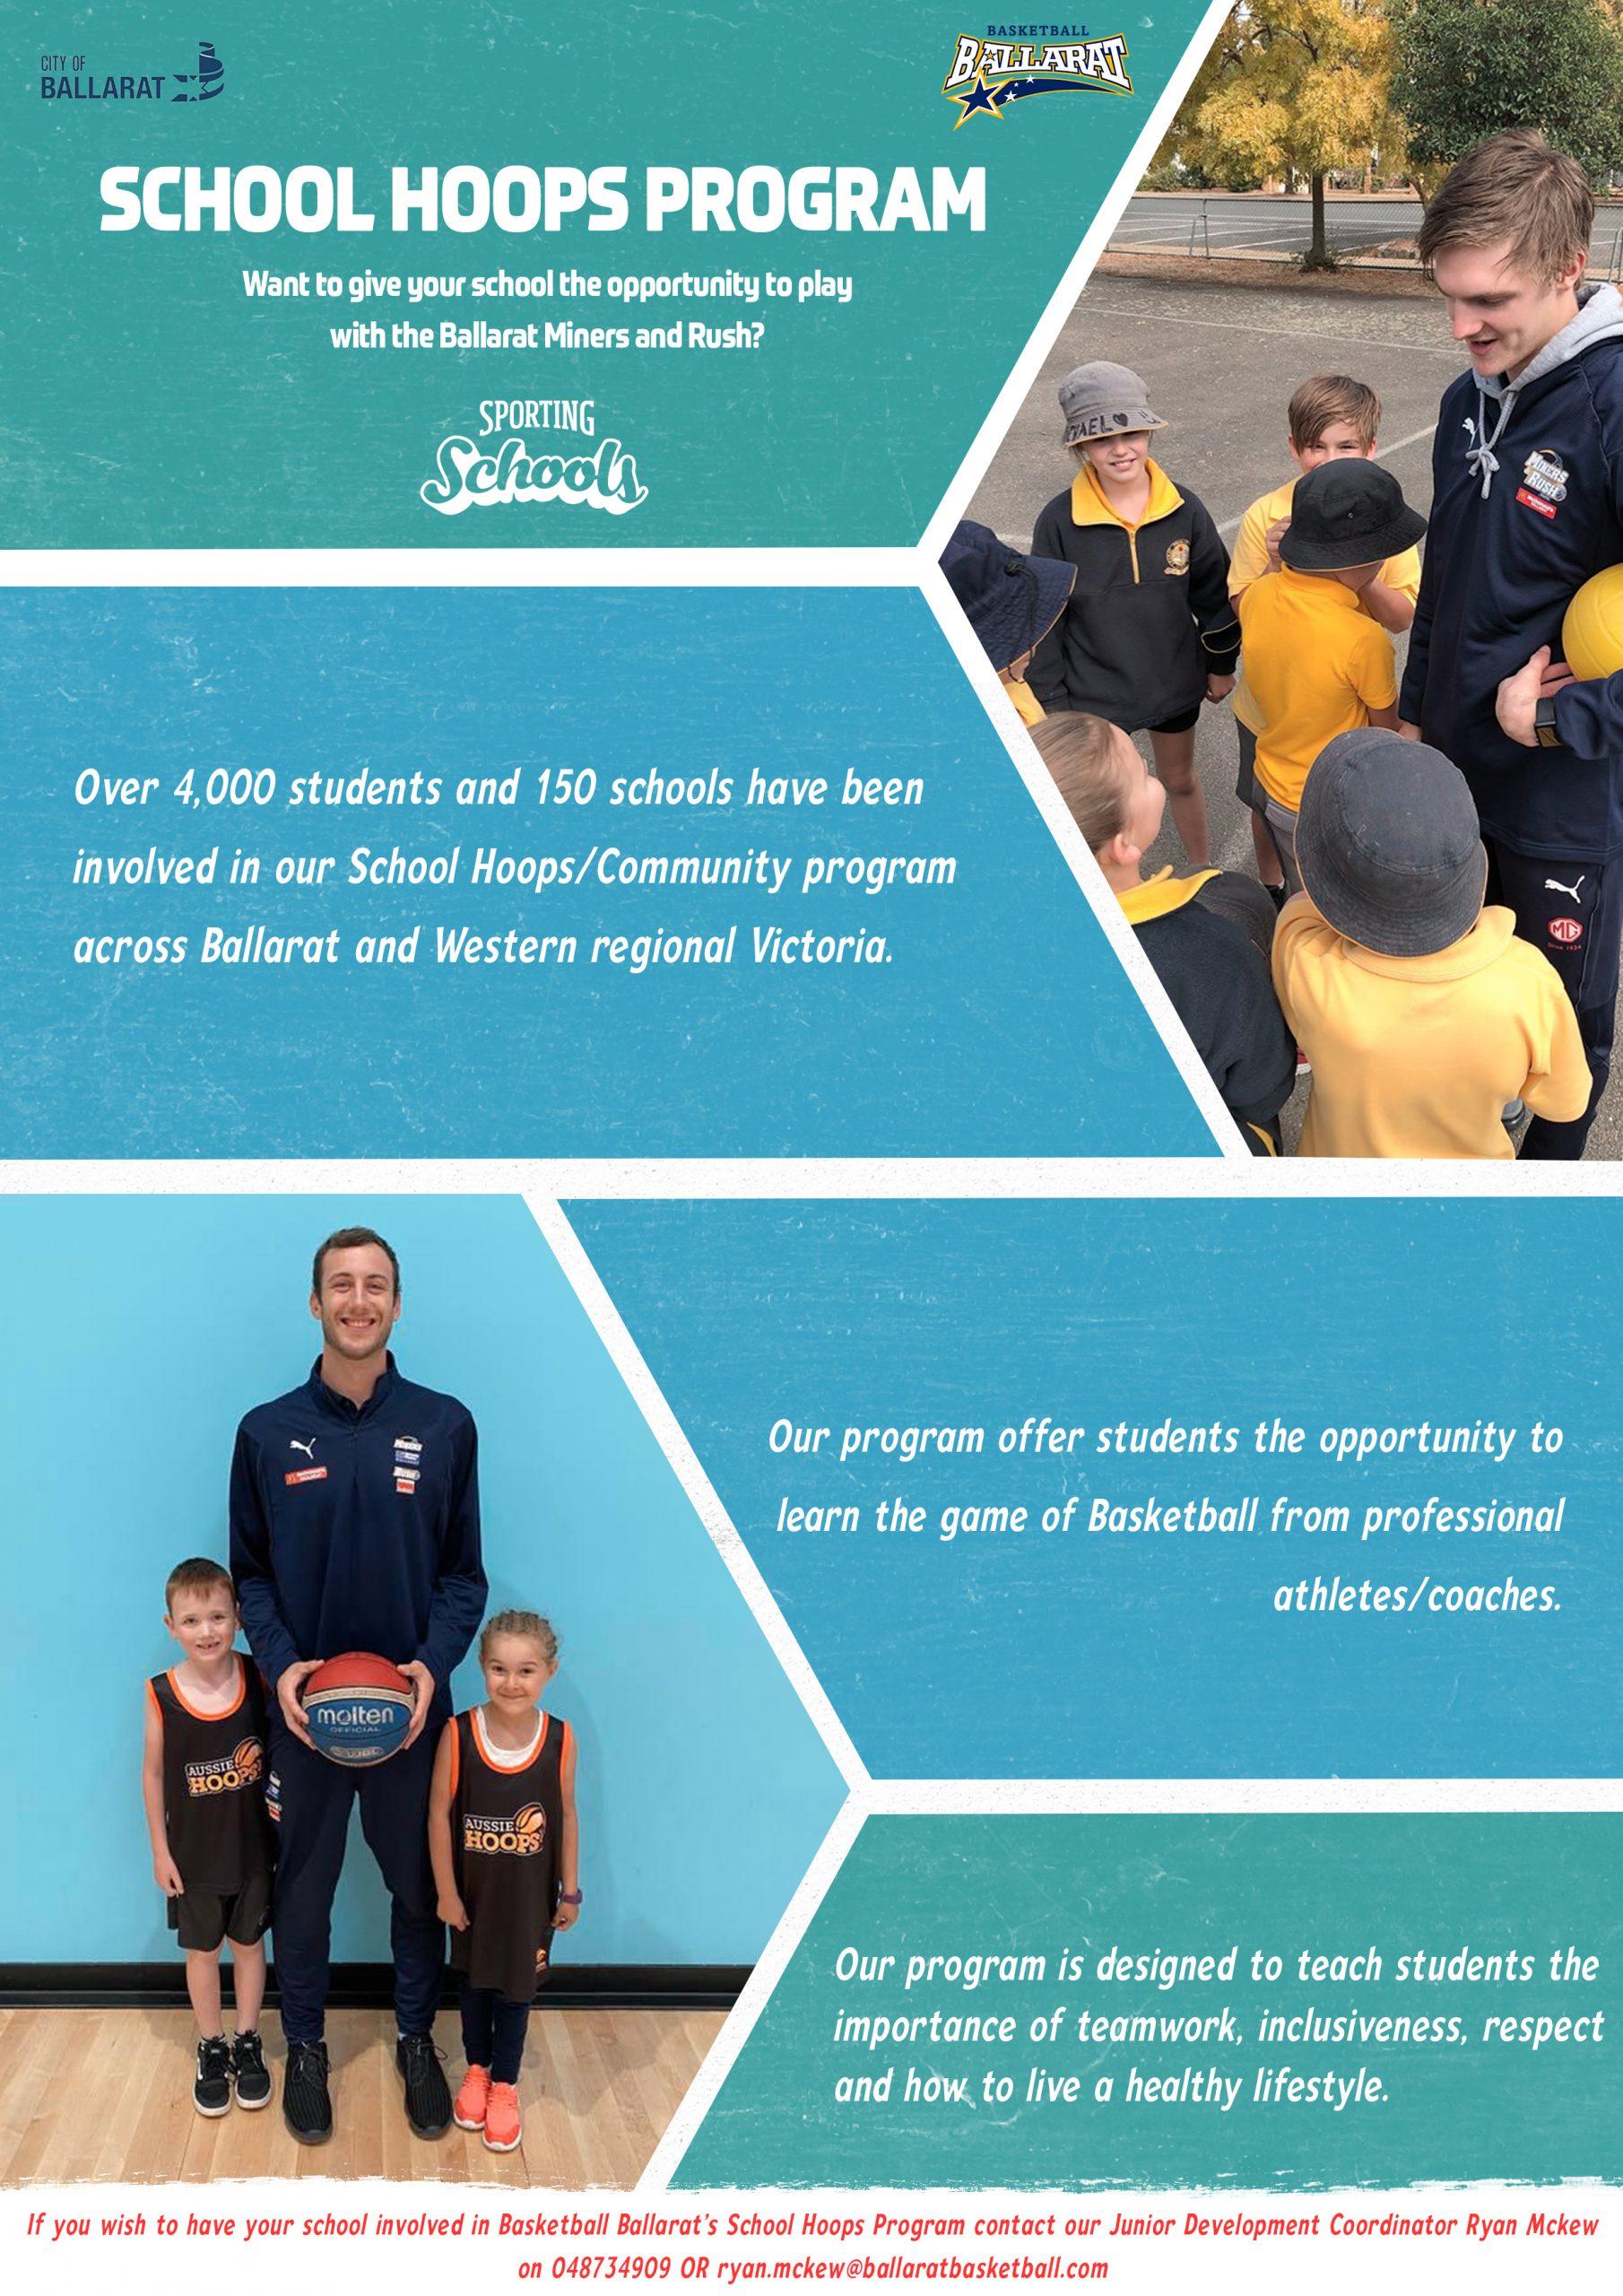 2020 Sporting schools poster